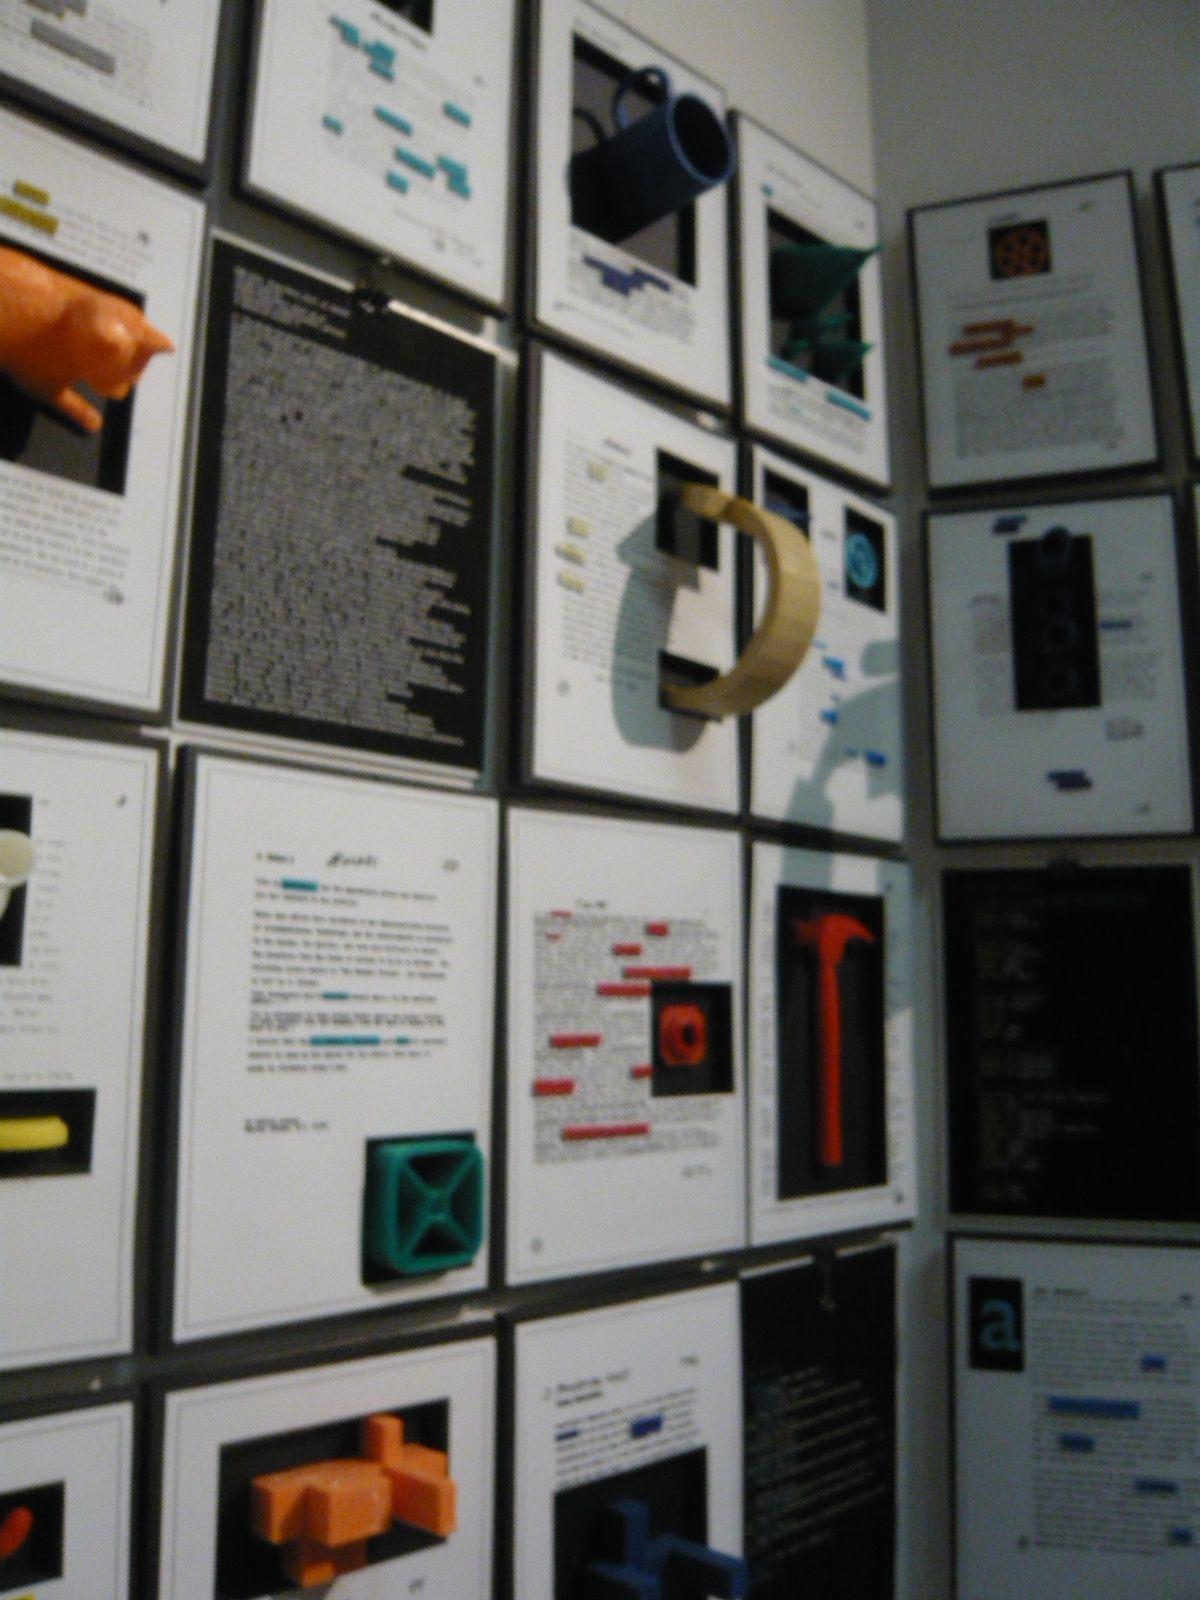 Florent Lagrange -Documents : Open (source) : Hearing